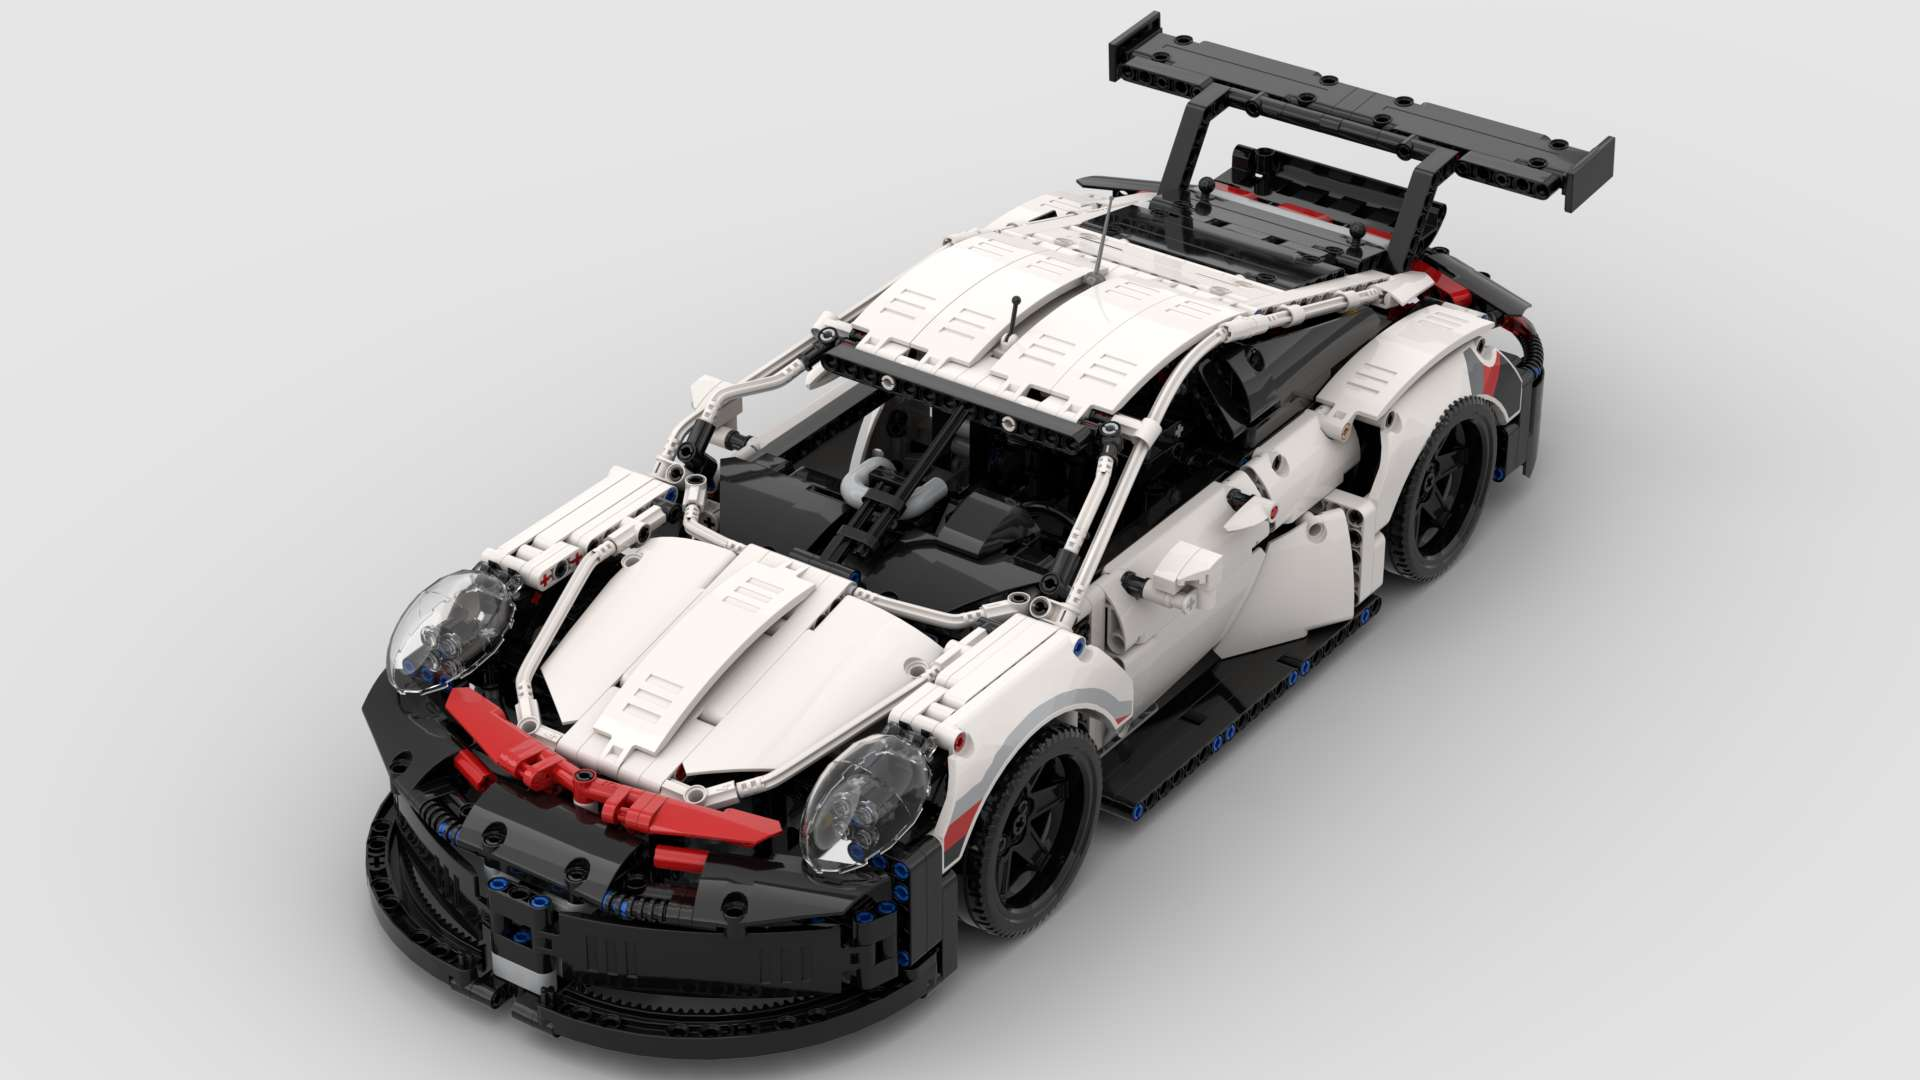 http://mistercreator.de/produkt/lego-42096-porsche-911-rsr-rc-umbau/